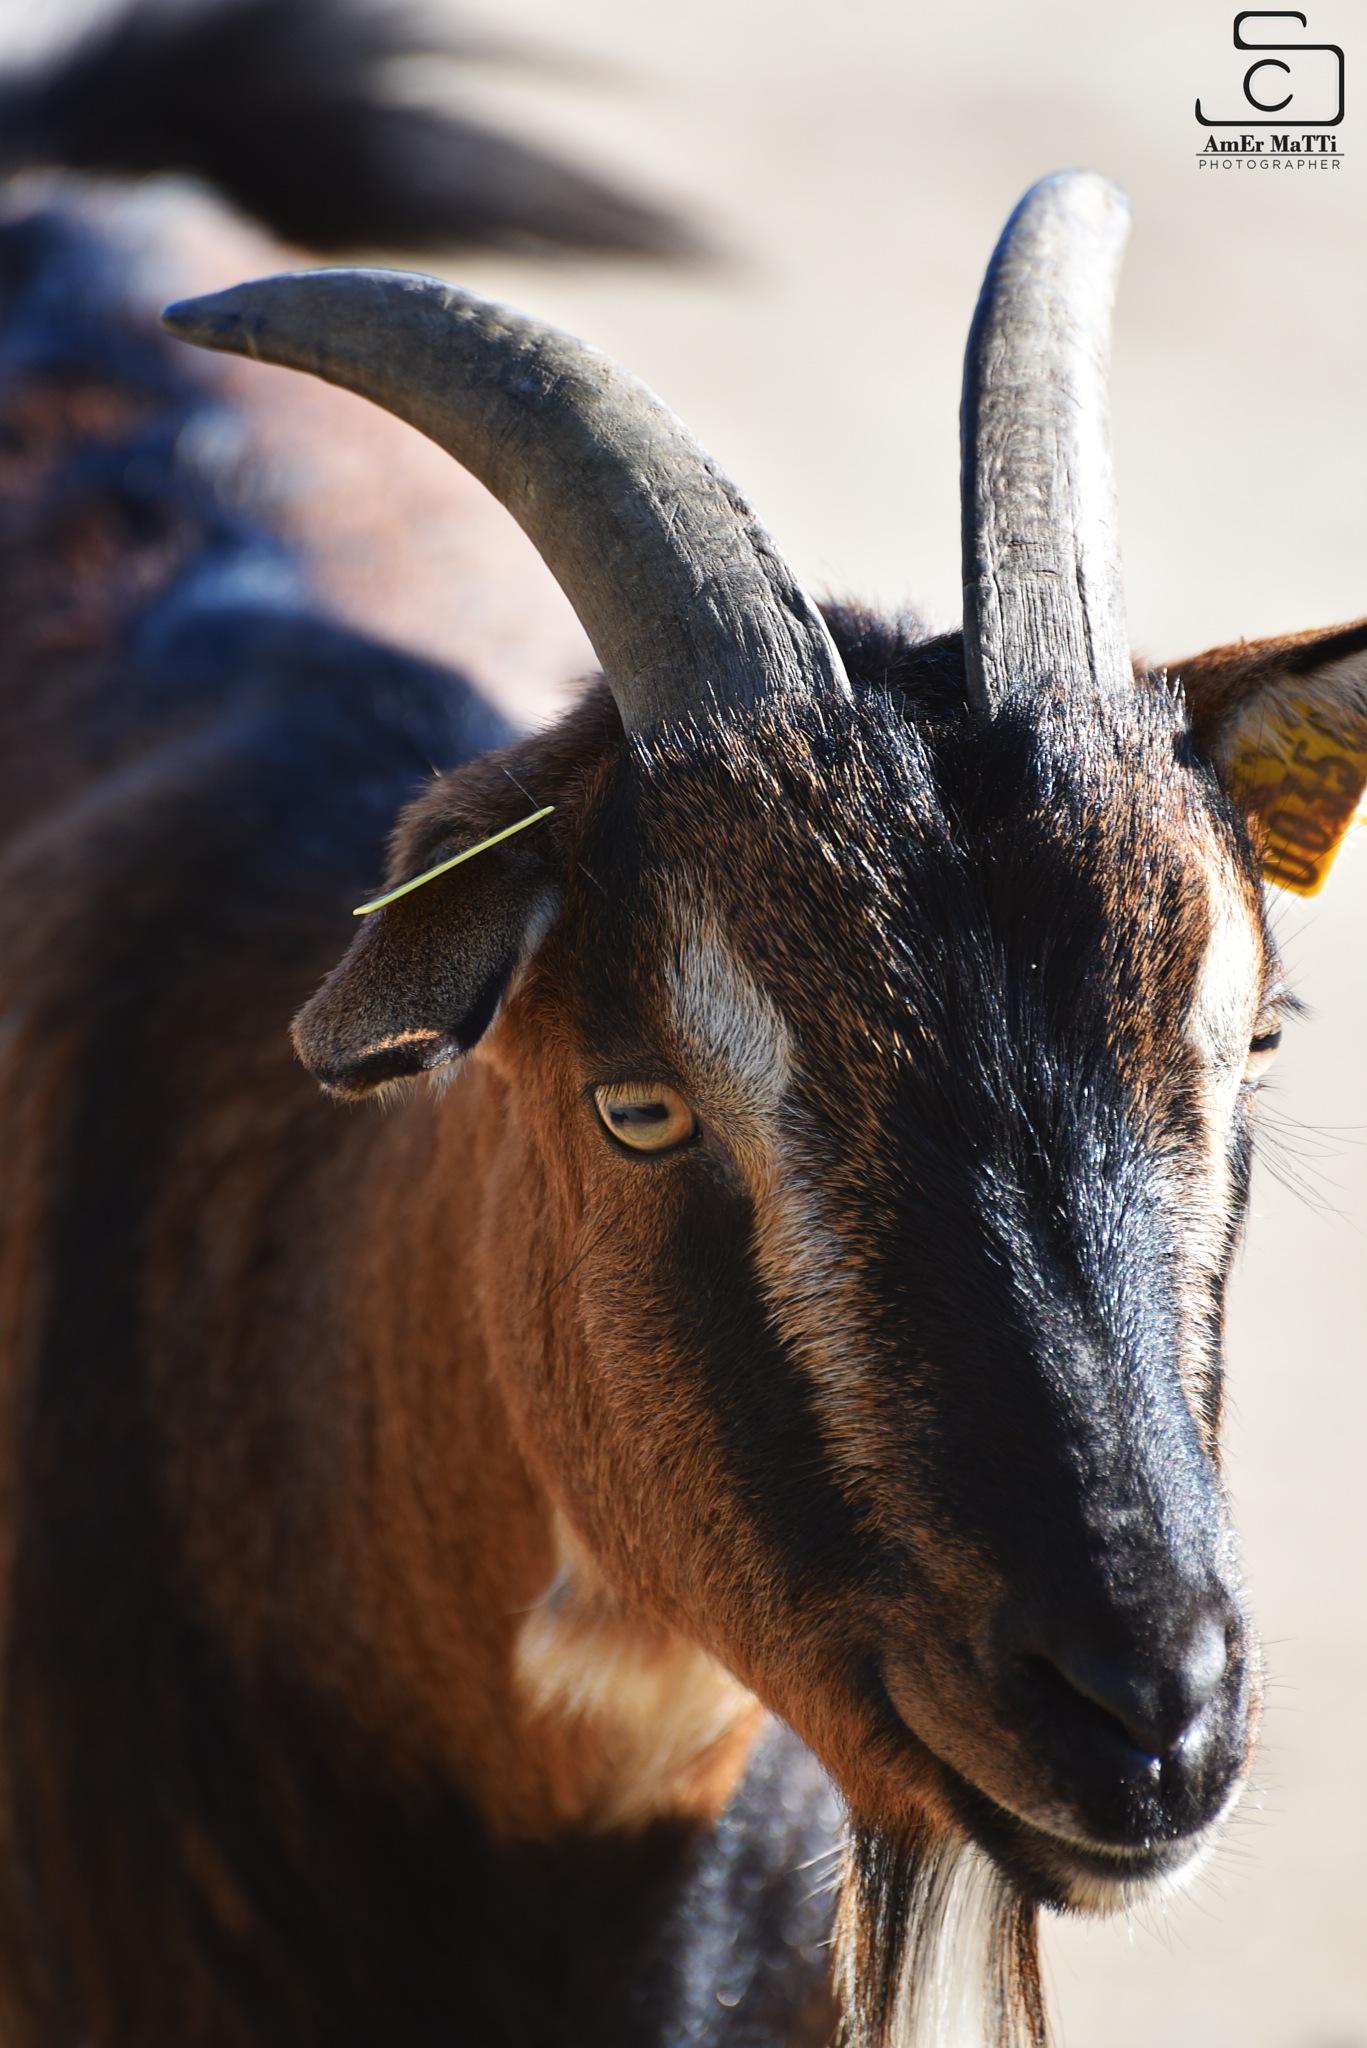 chèvre by Amer BARSOUM